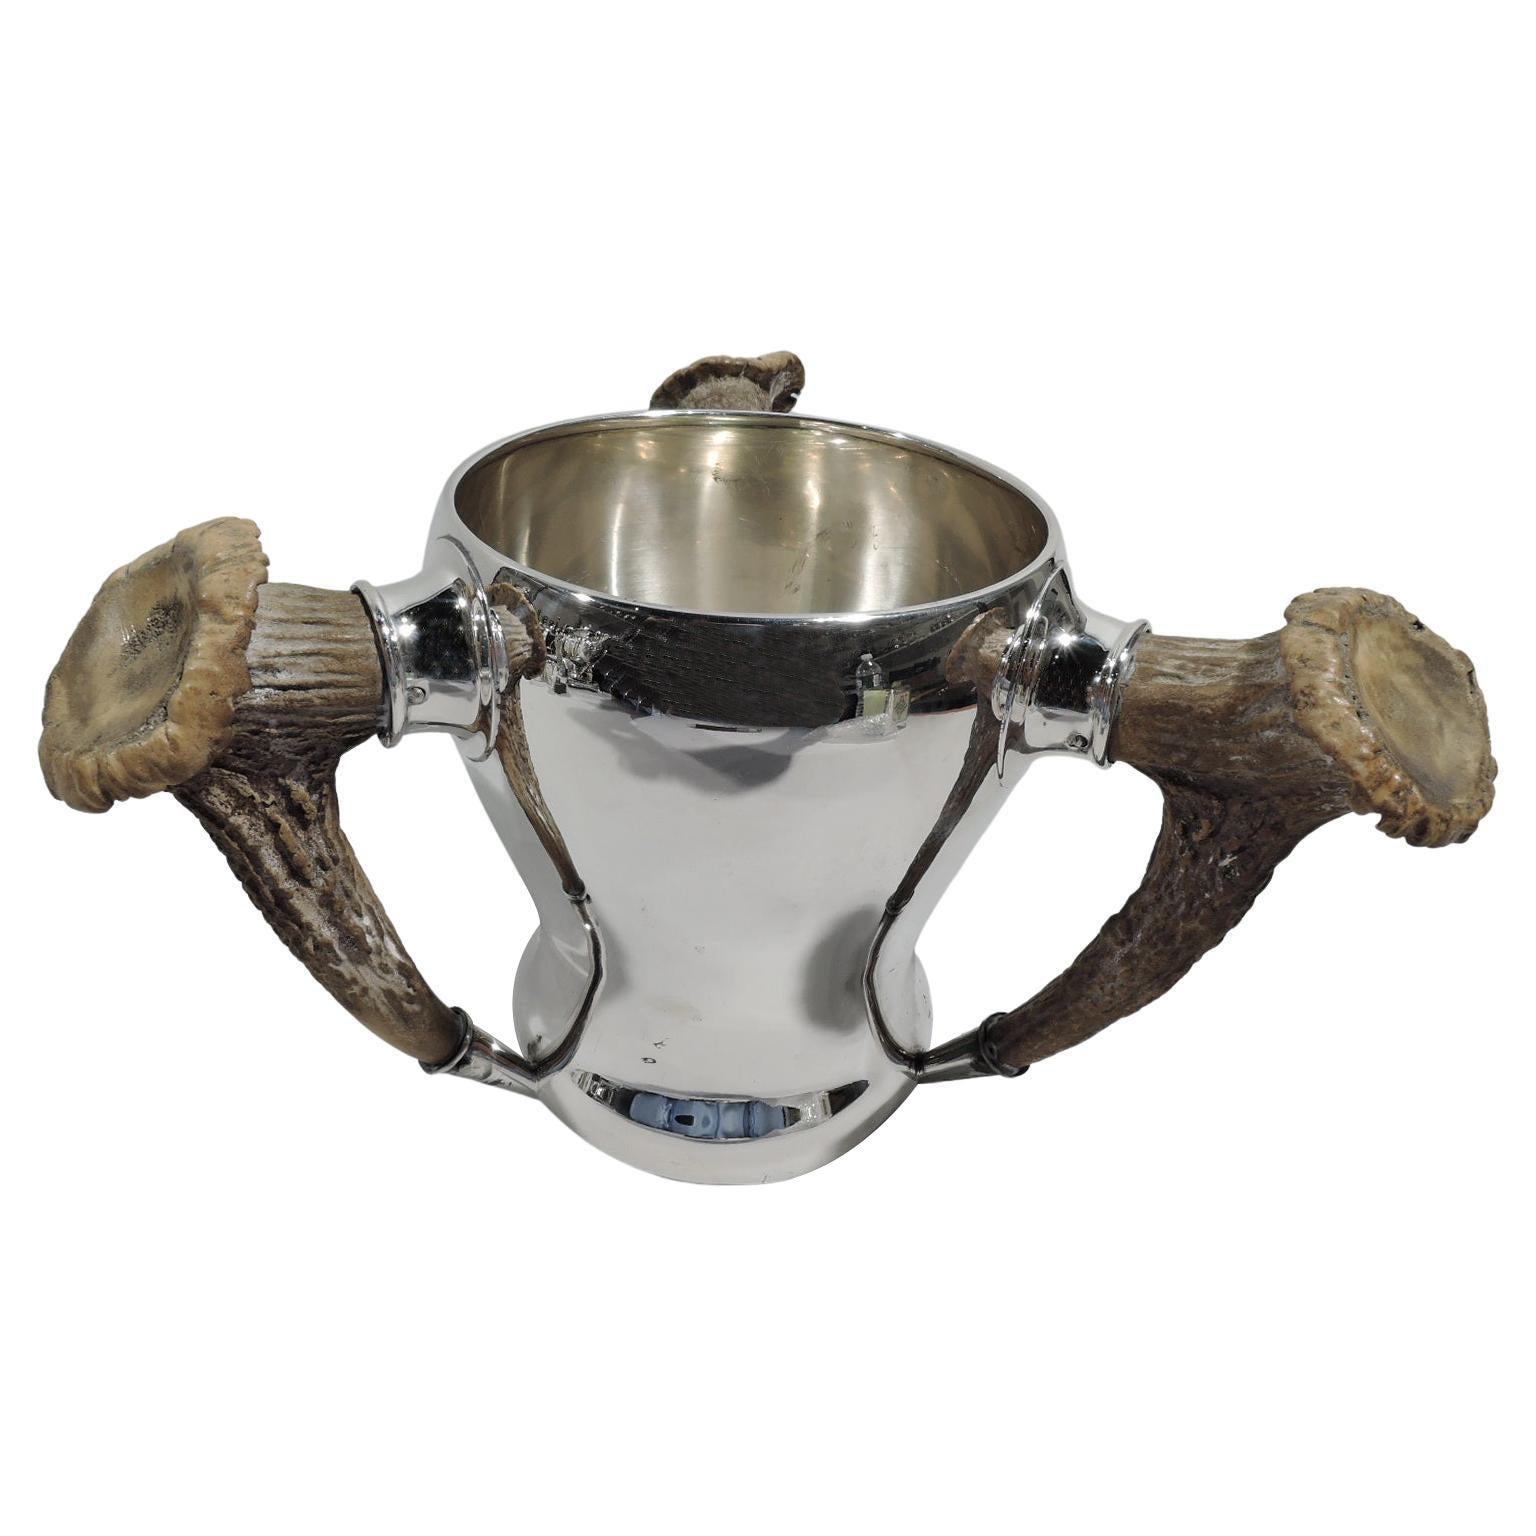 Gorham Big-Game Era Sterling Silver Loving Cup with Antler Handles